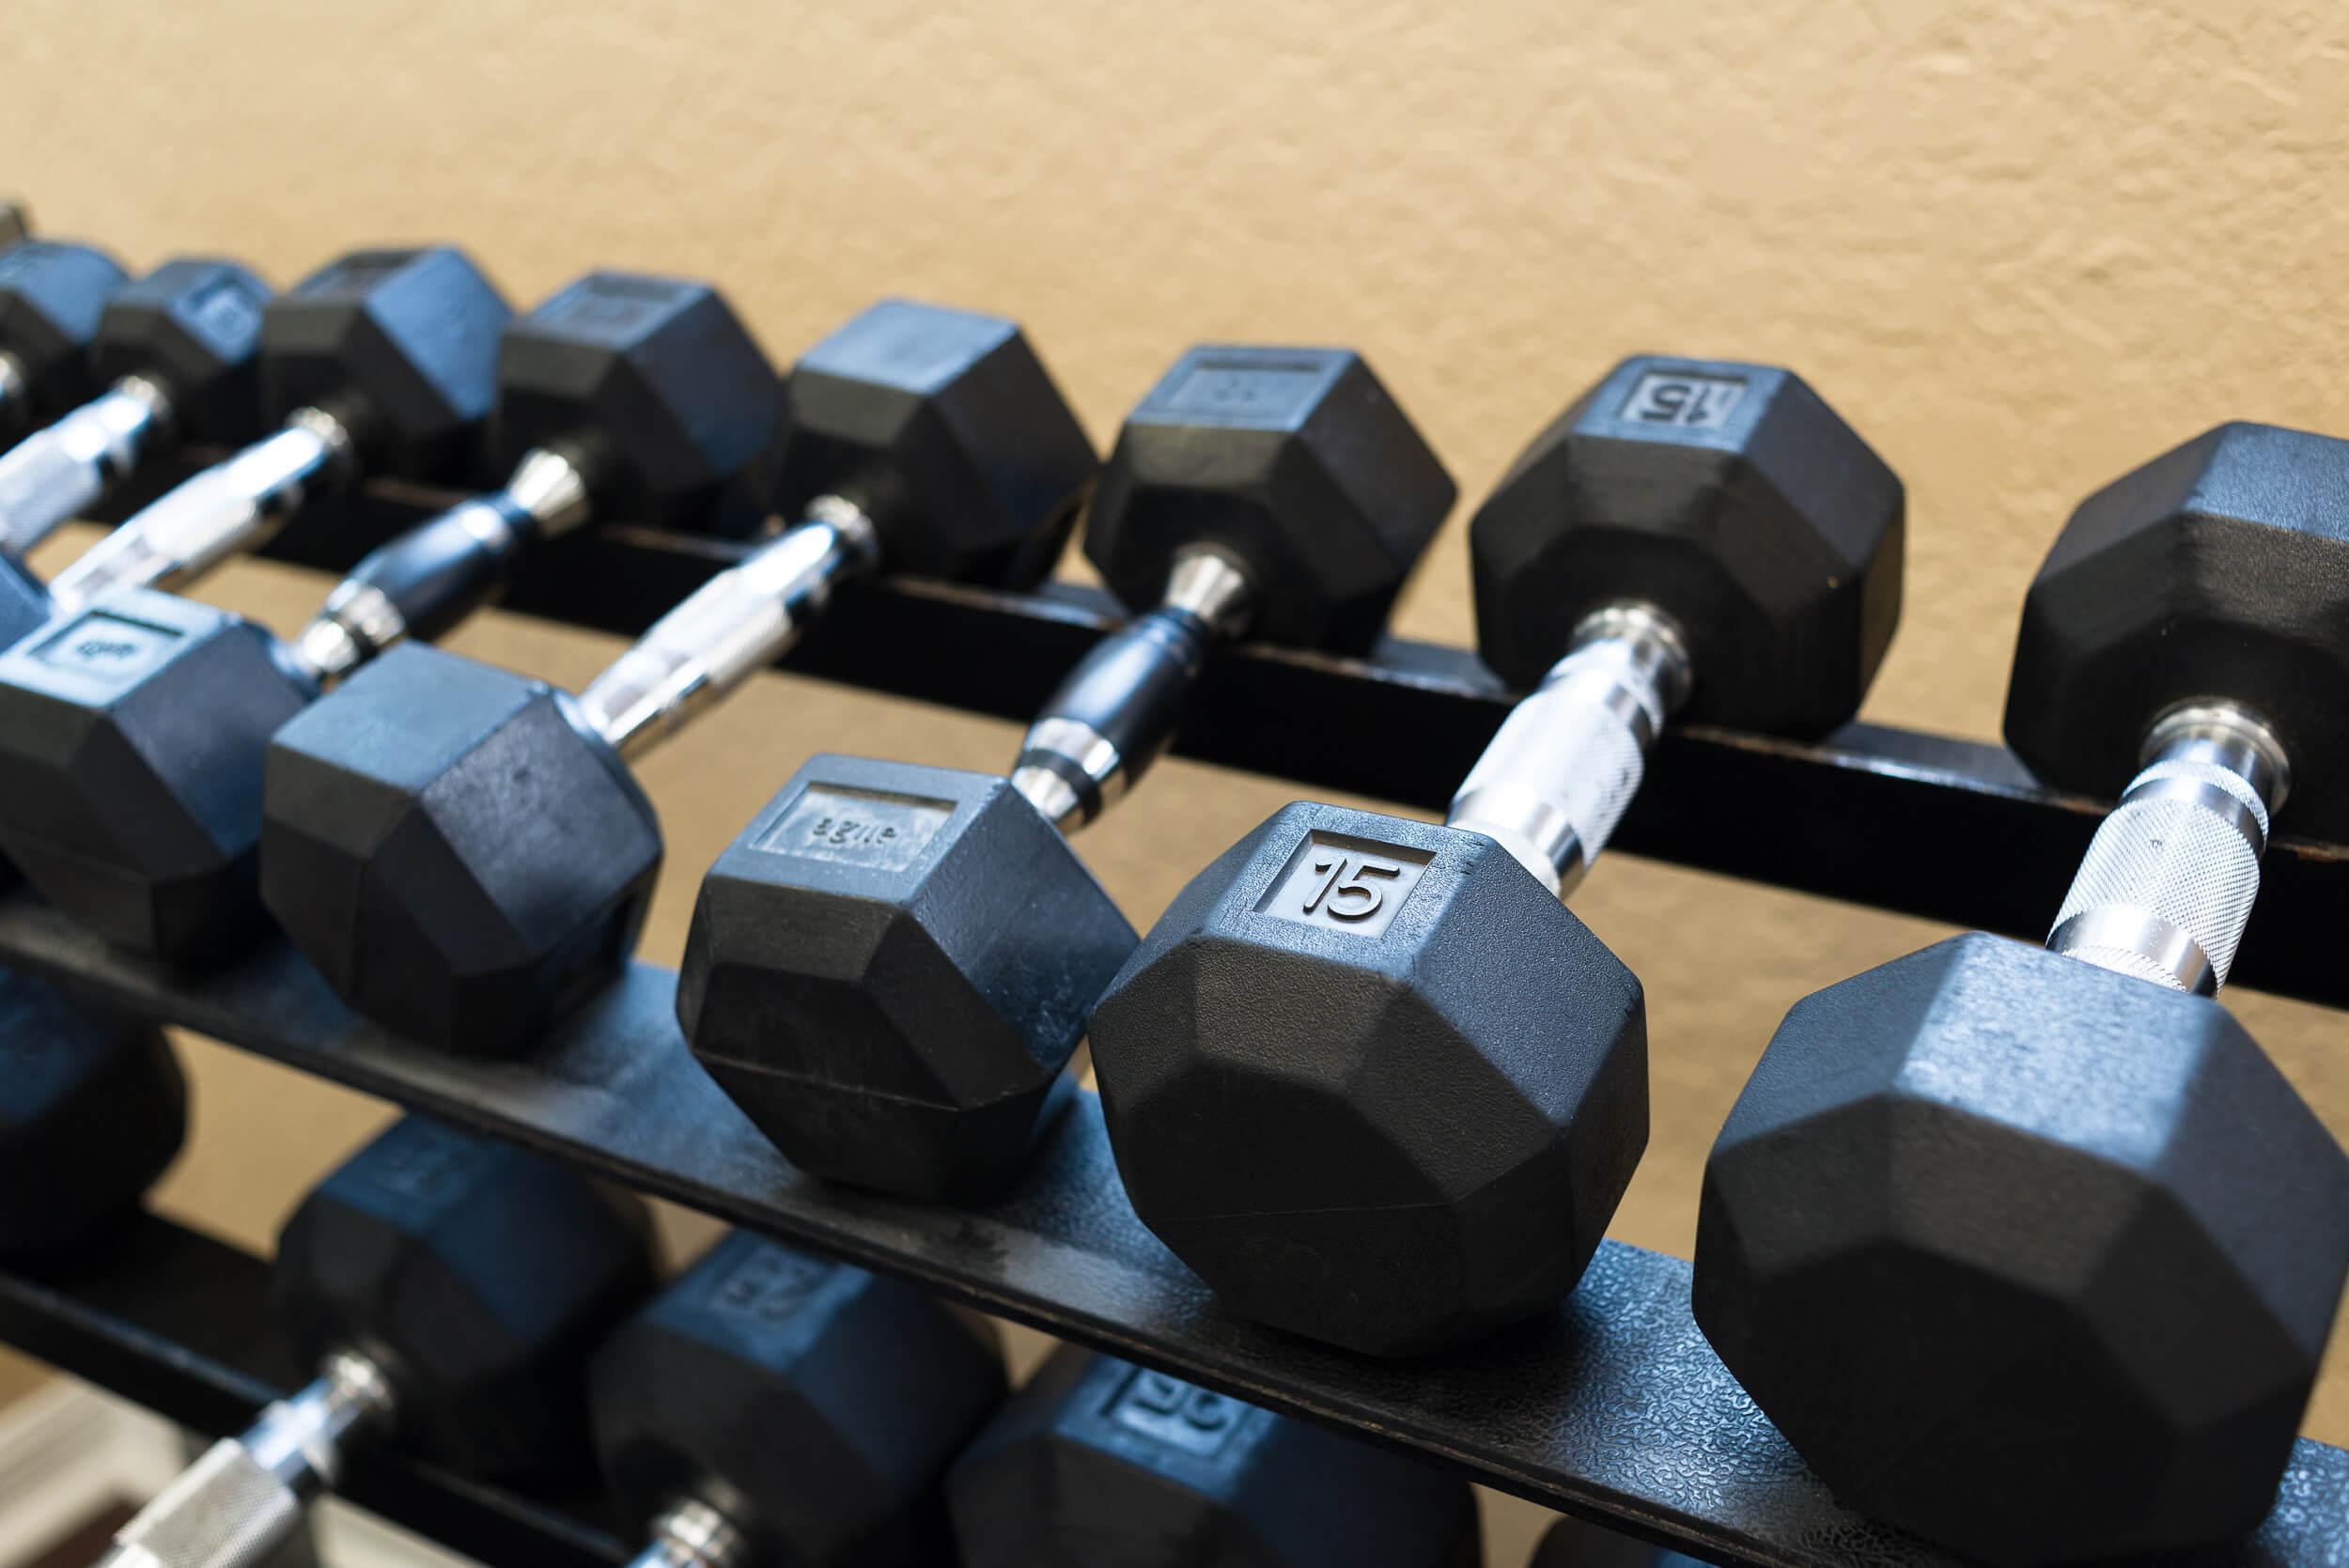 Fitness Center Weights at Painted Mountain golf resort Mesa AZ | Westgate Painted Mountain Golf Resort | Westgate Resorts